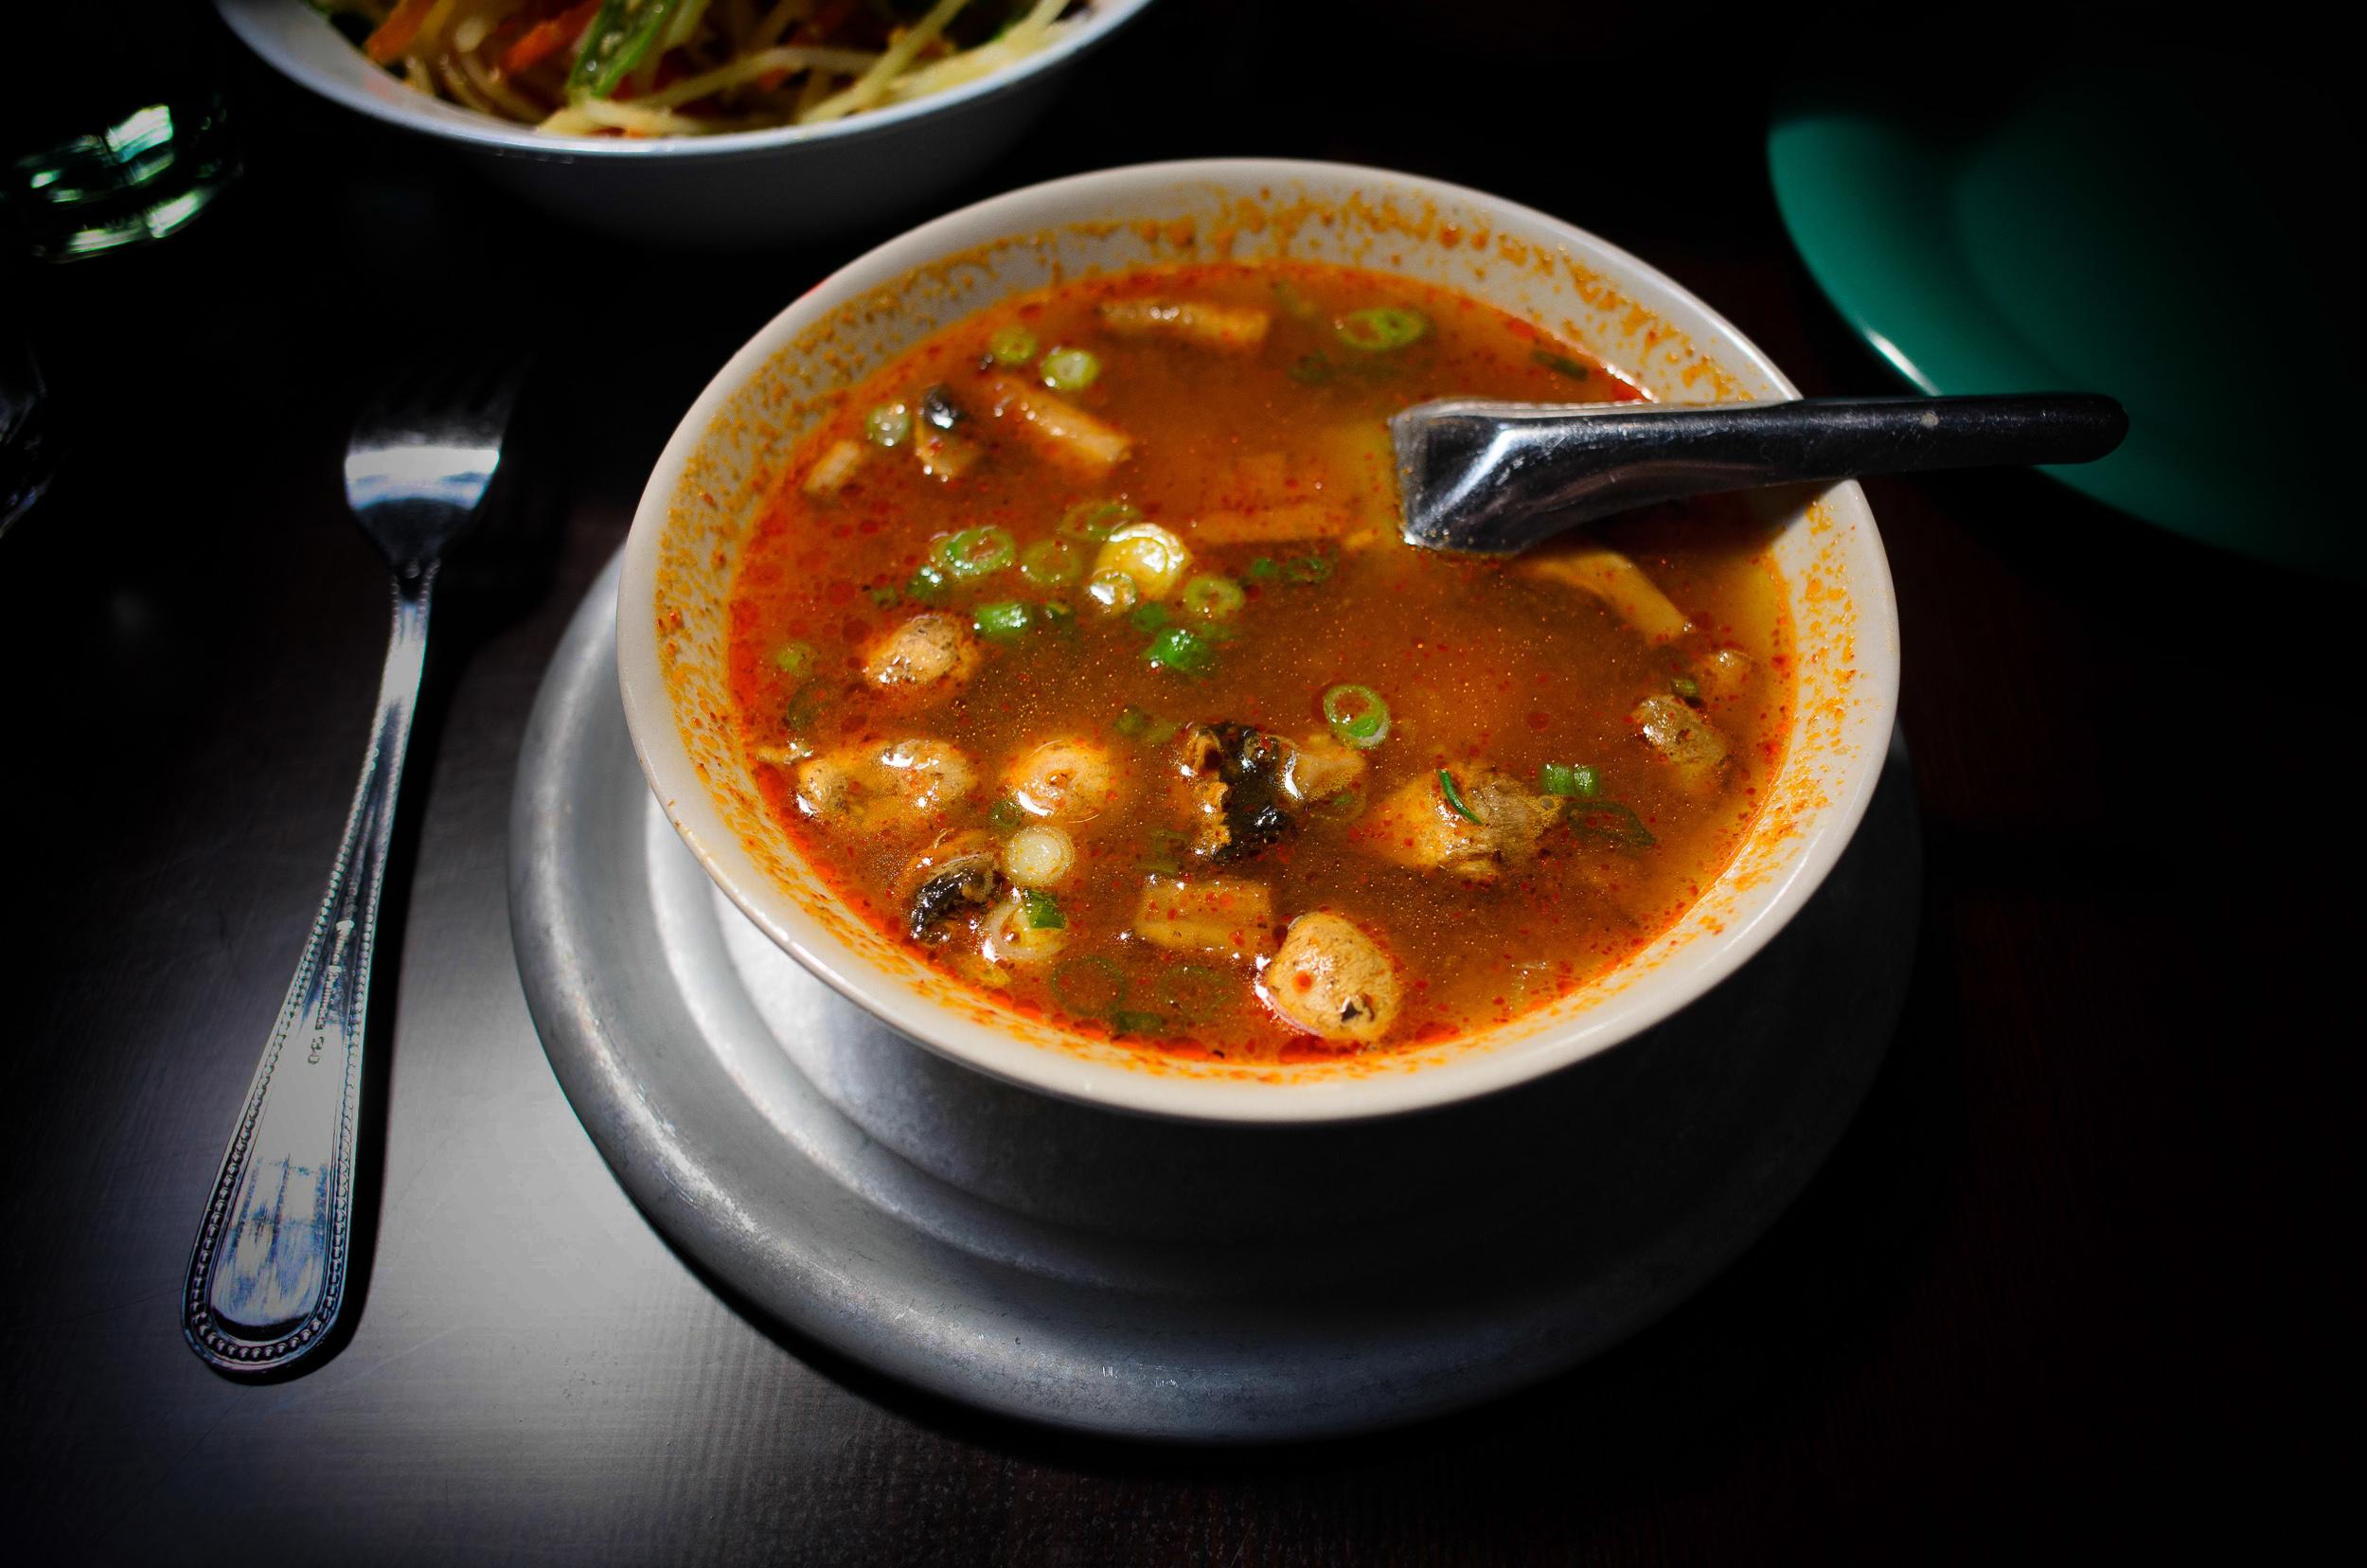 Tom yum (lemongrass) soup: savory sour soup w/ mushrooms, tradit